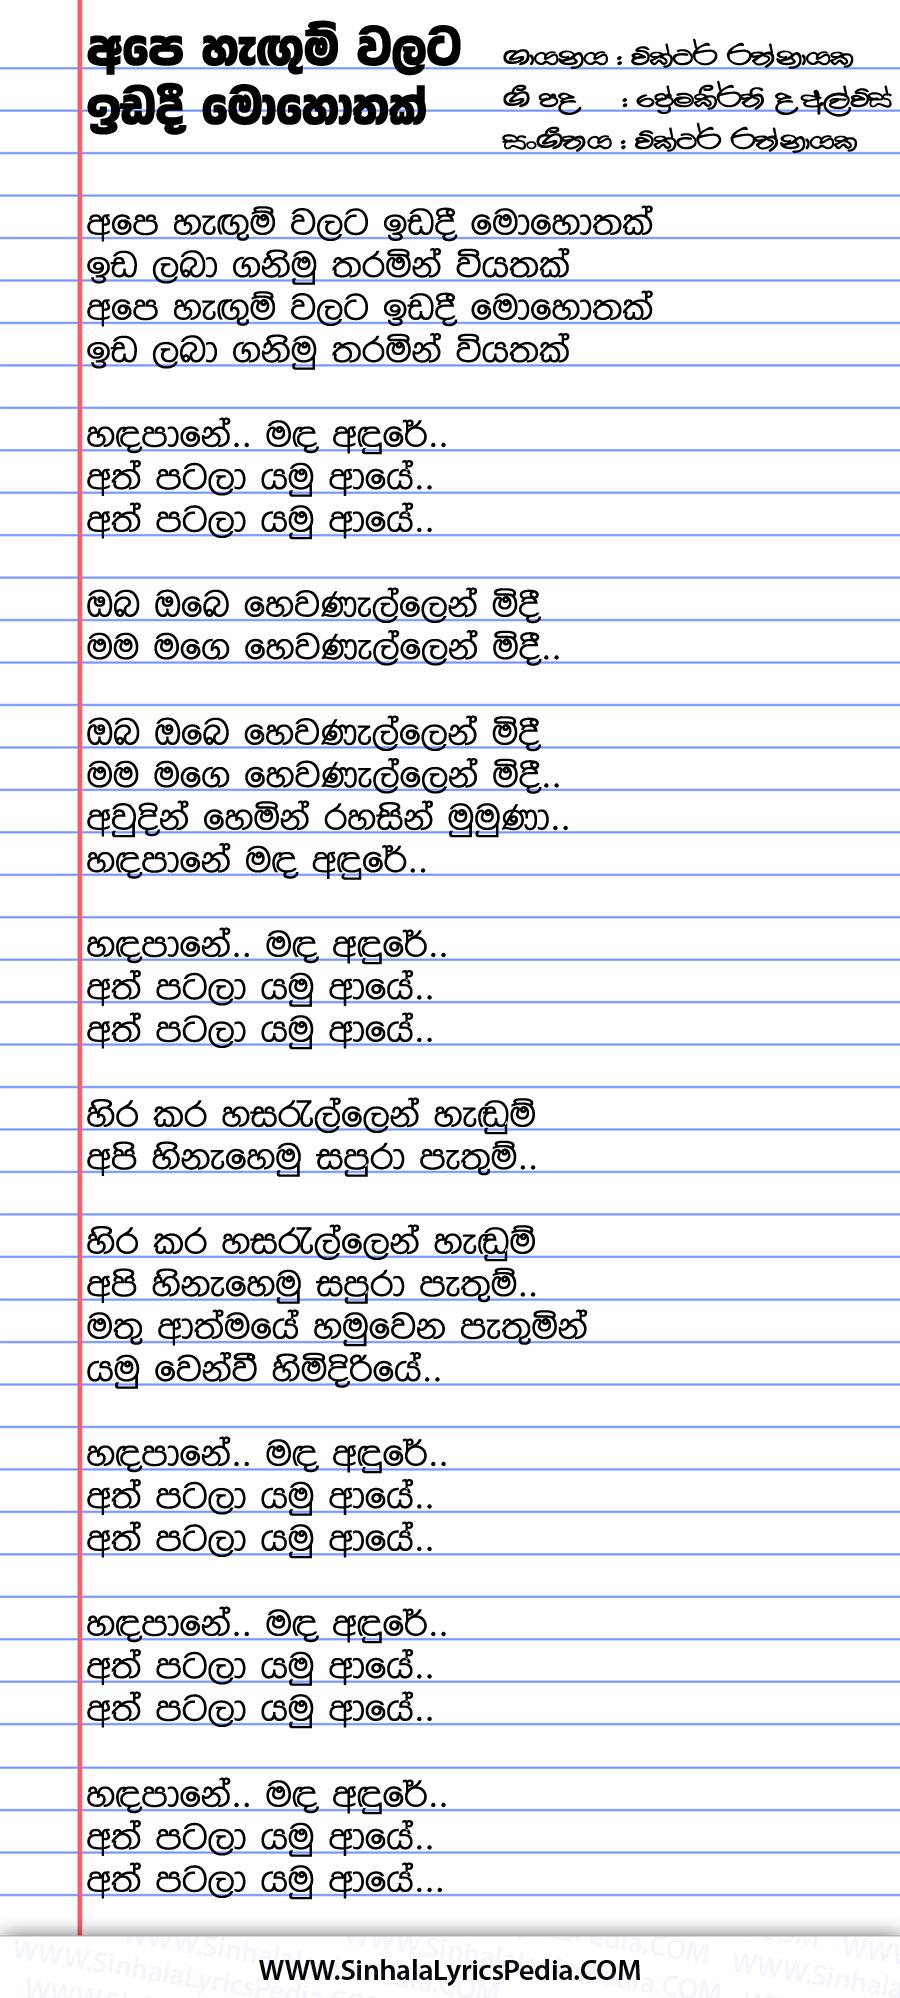 Api Hangum Walata Idadee Mohothak Song Lyrics